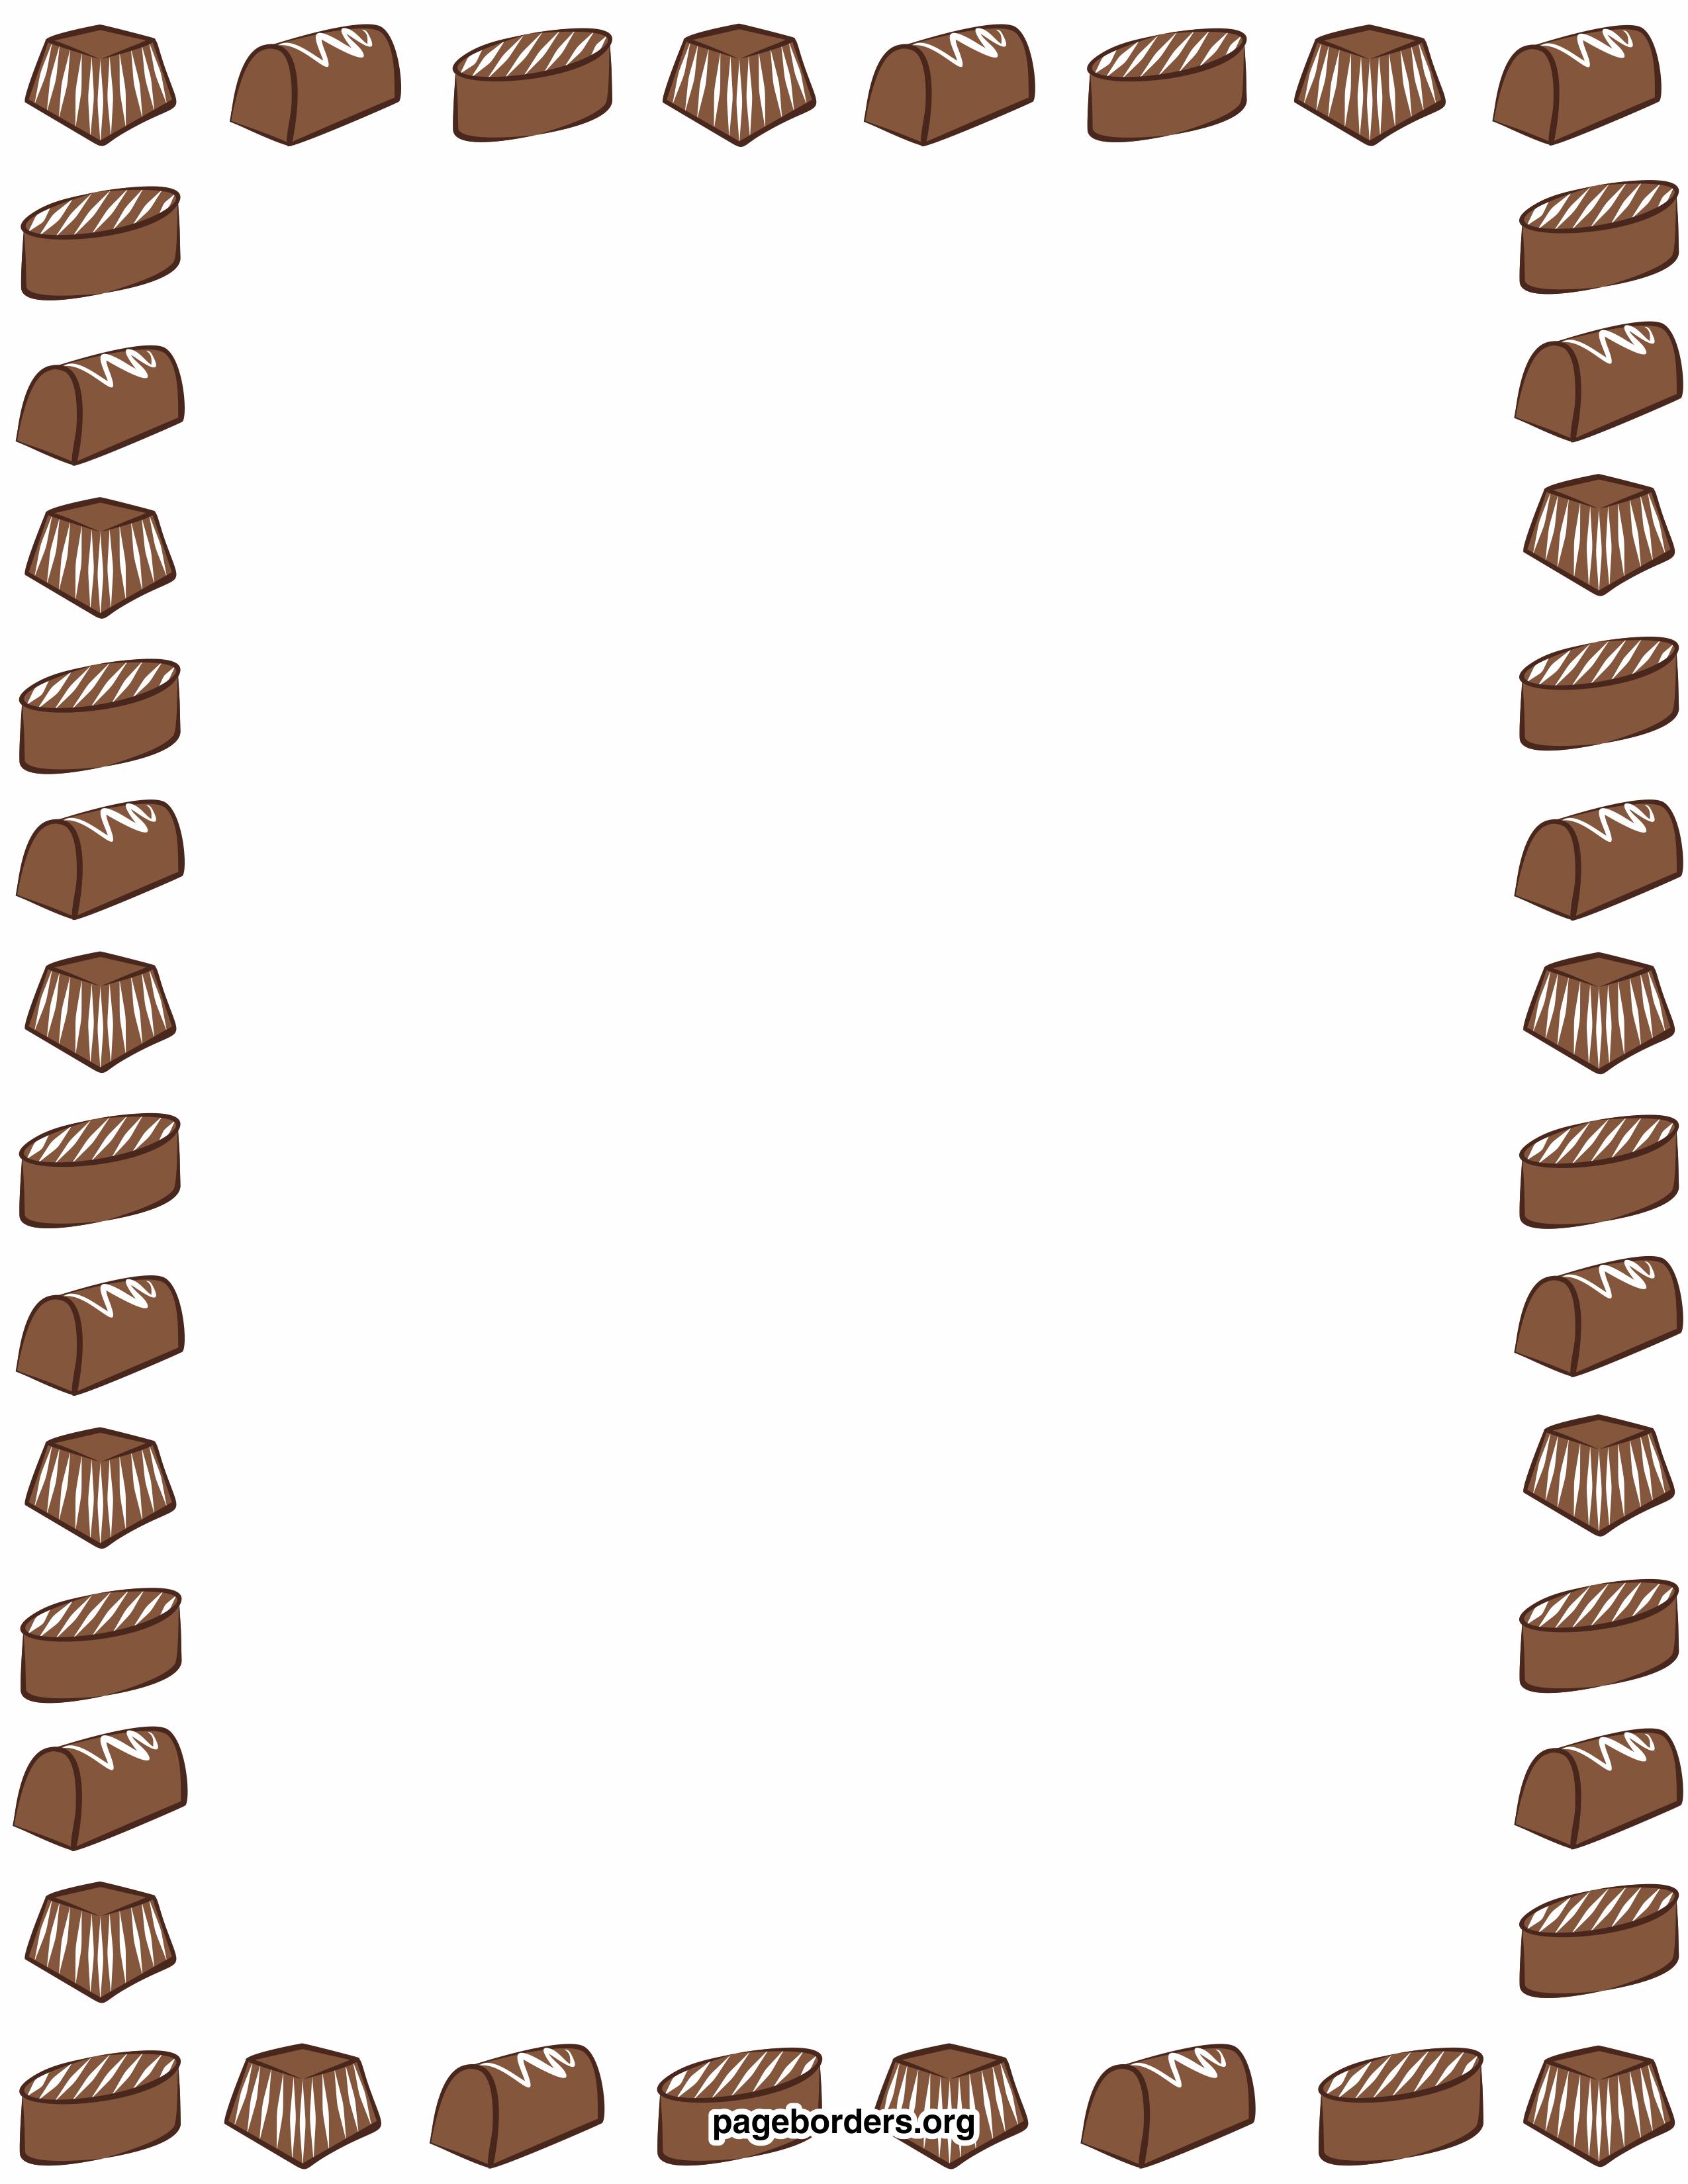 chocolate border clipart panda free clipart images rh clipartpanda com Peanut Butter Cup Clip Art Clip Art Alcoholic Beverages